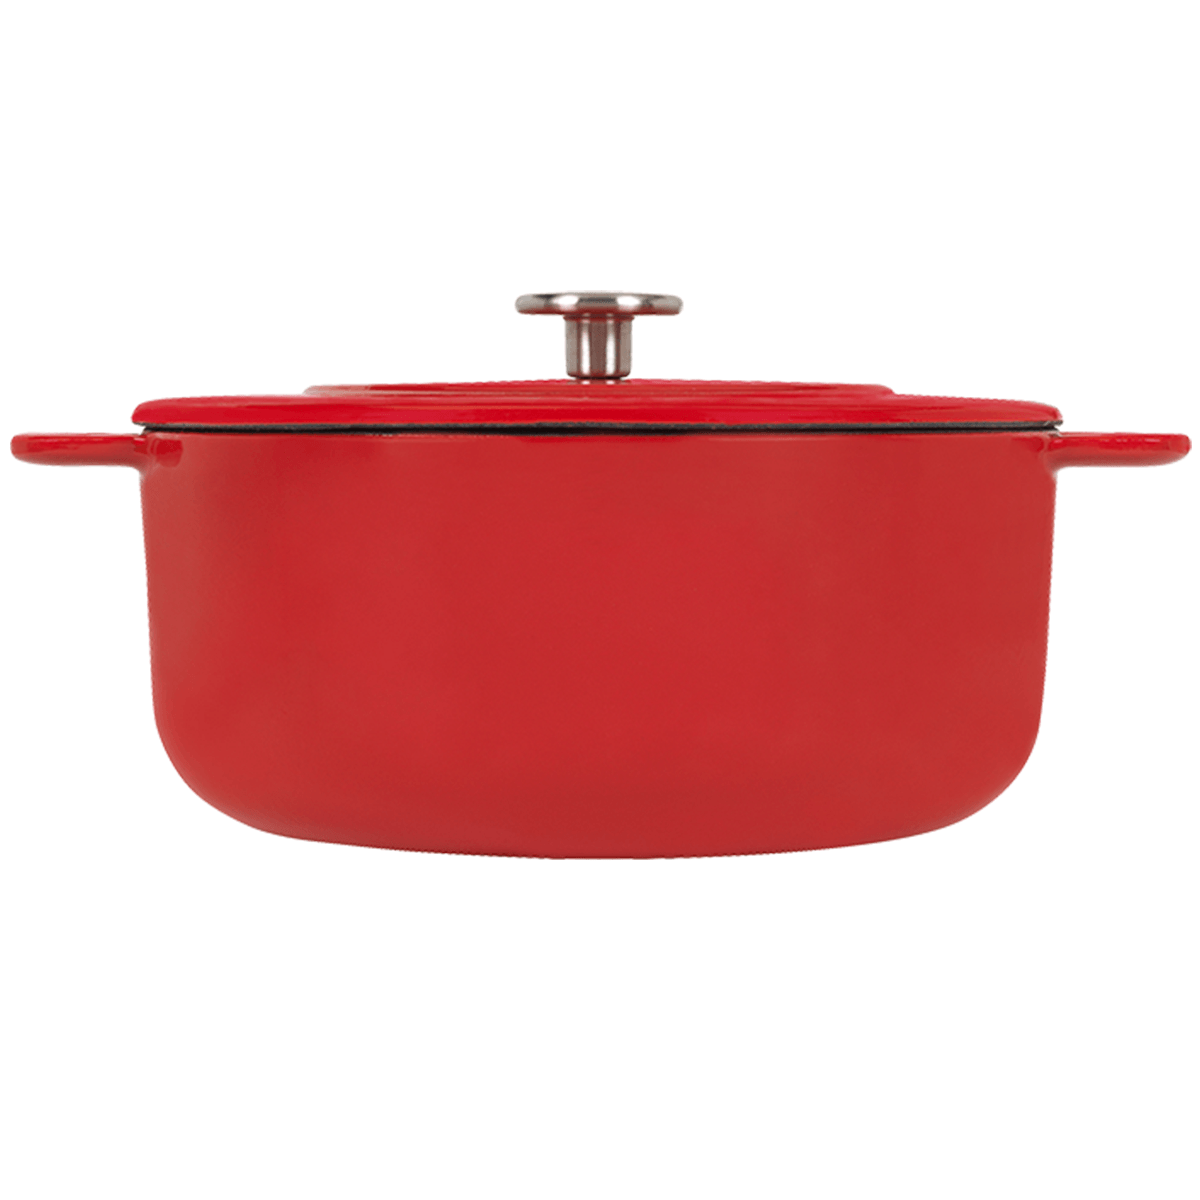 Sous-Chef Dutch Oven-4